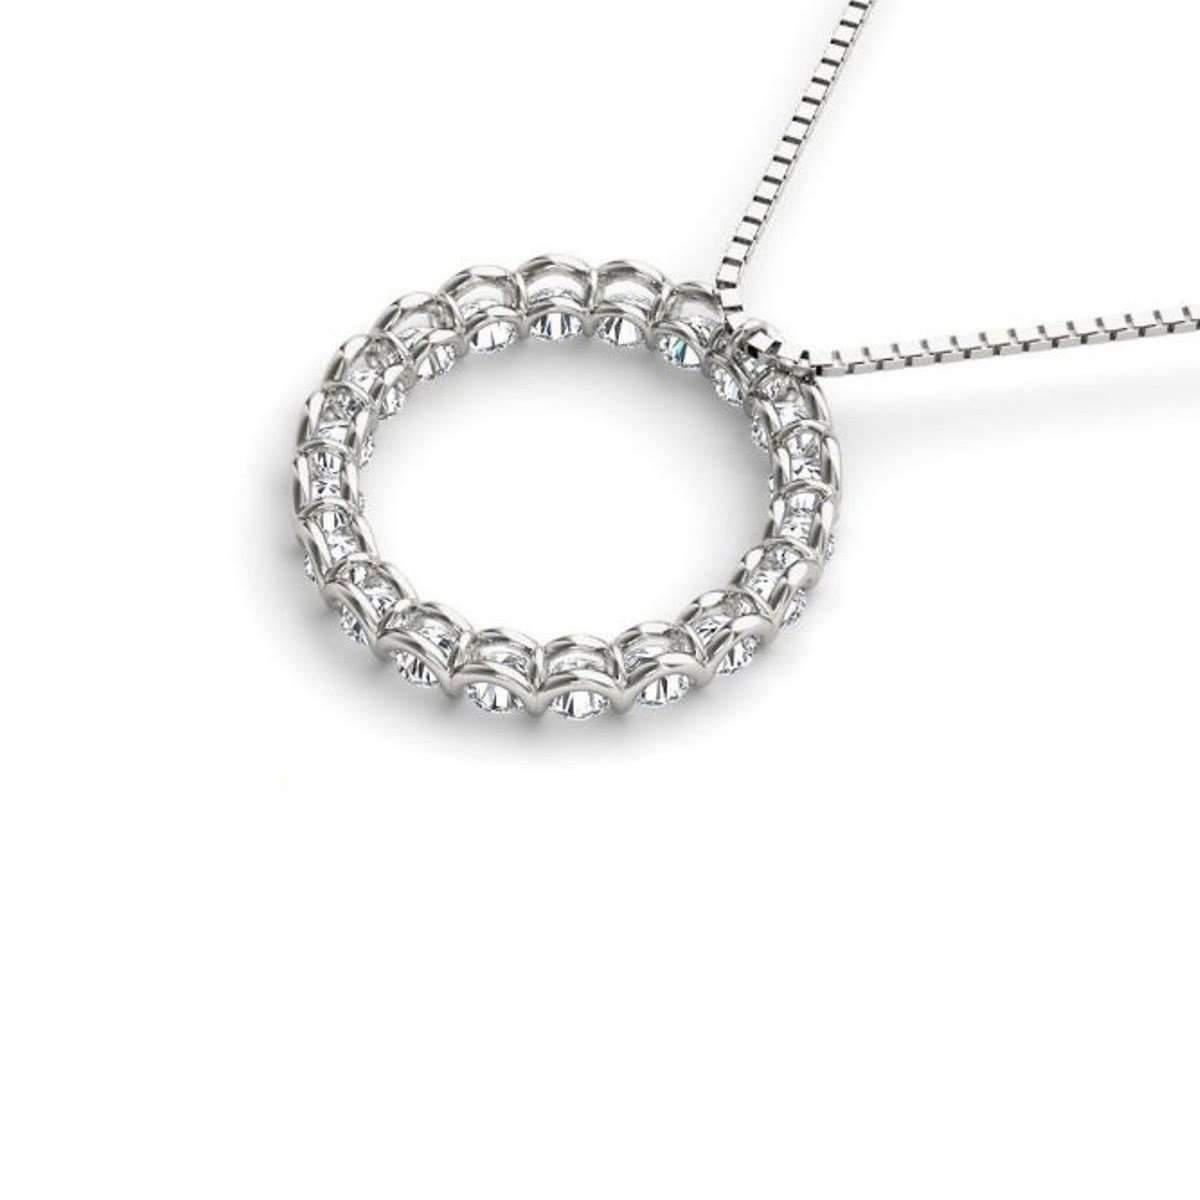 Diamoire Jewels White Round Swarovski Zirconia Pendant in 10Kt White Gold gPt86RQ